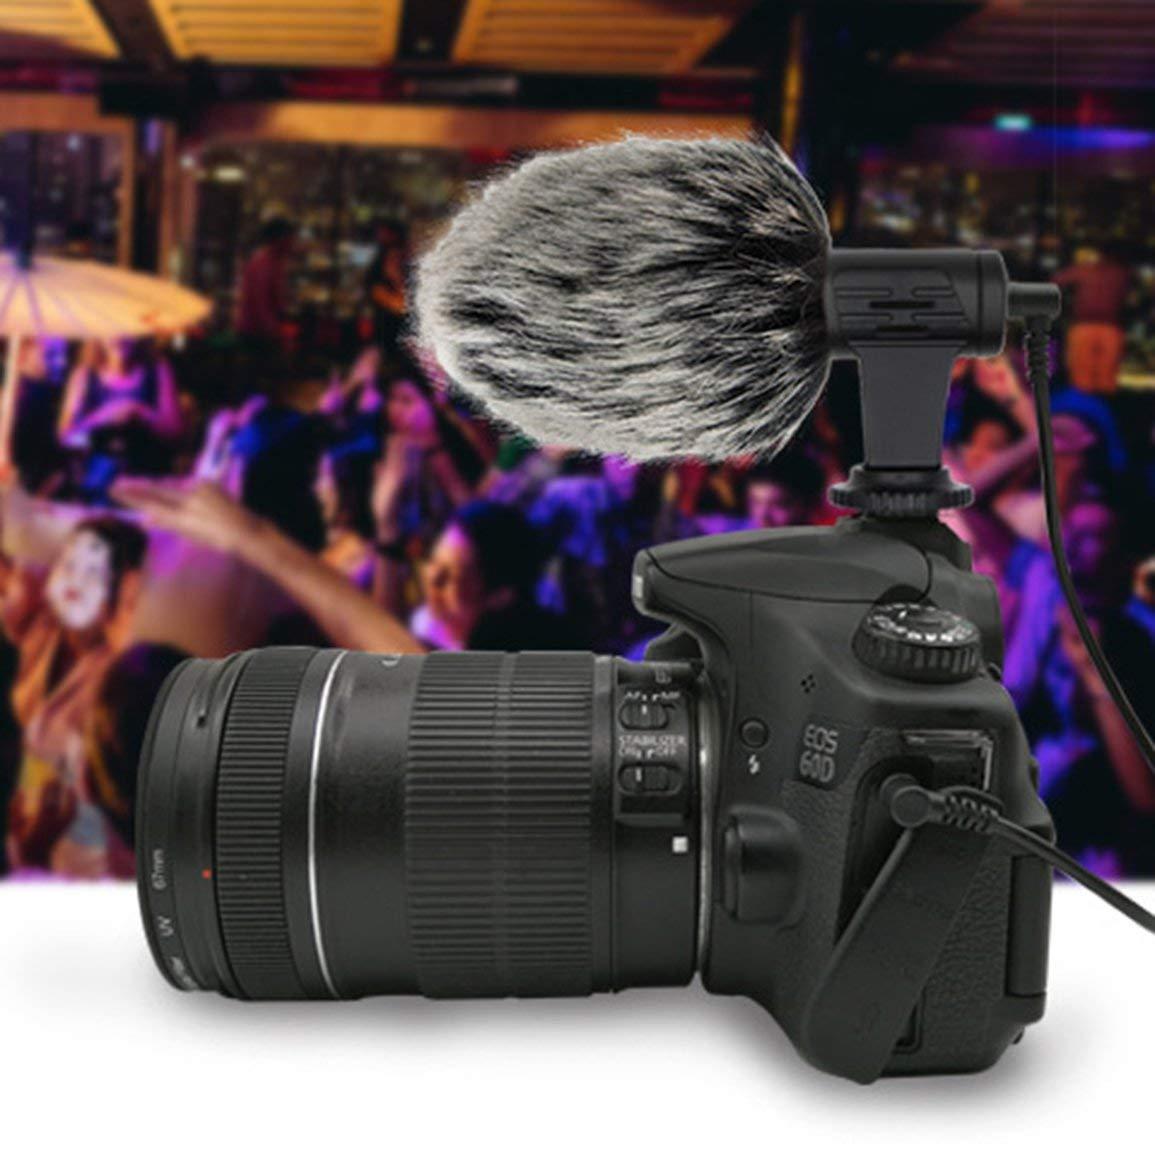 Micr/ófono port/átil m/óvil tel/éfono con c/ámara peque/ña Mic Fotograf/ía Mini 3.5mm Micr/ófono condensador para Smartphone